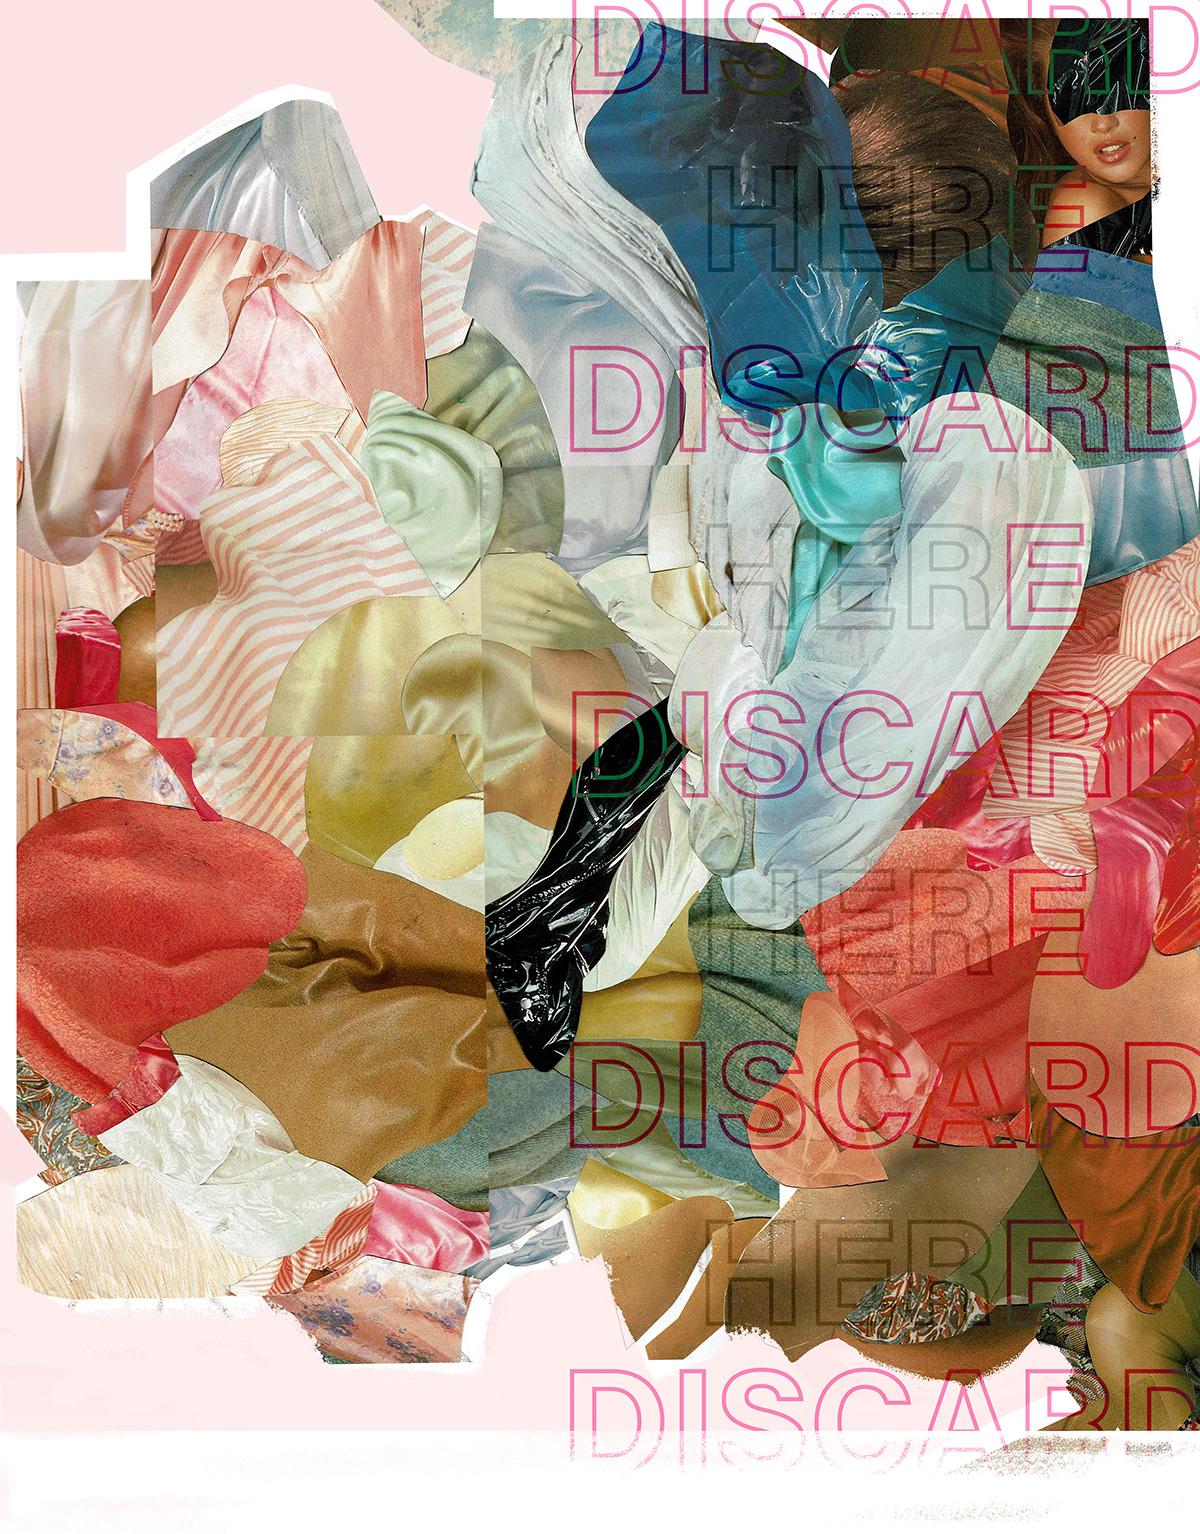 brand collage discard here editorial fabric Fashion  feminist maagazine porn